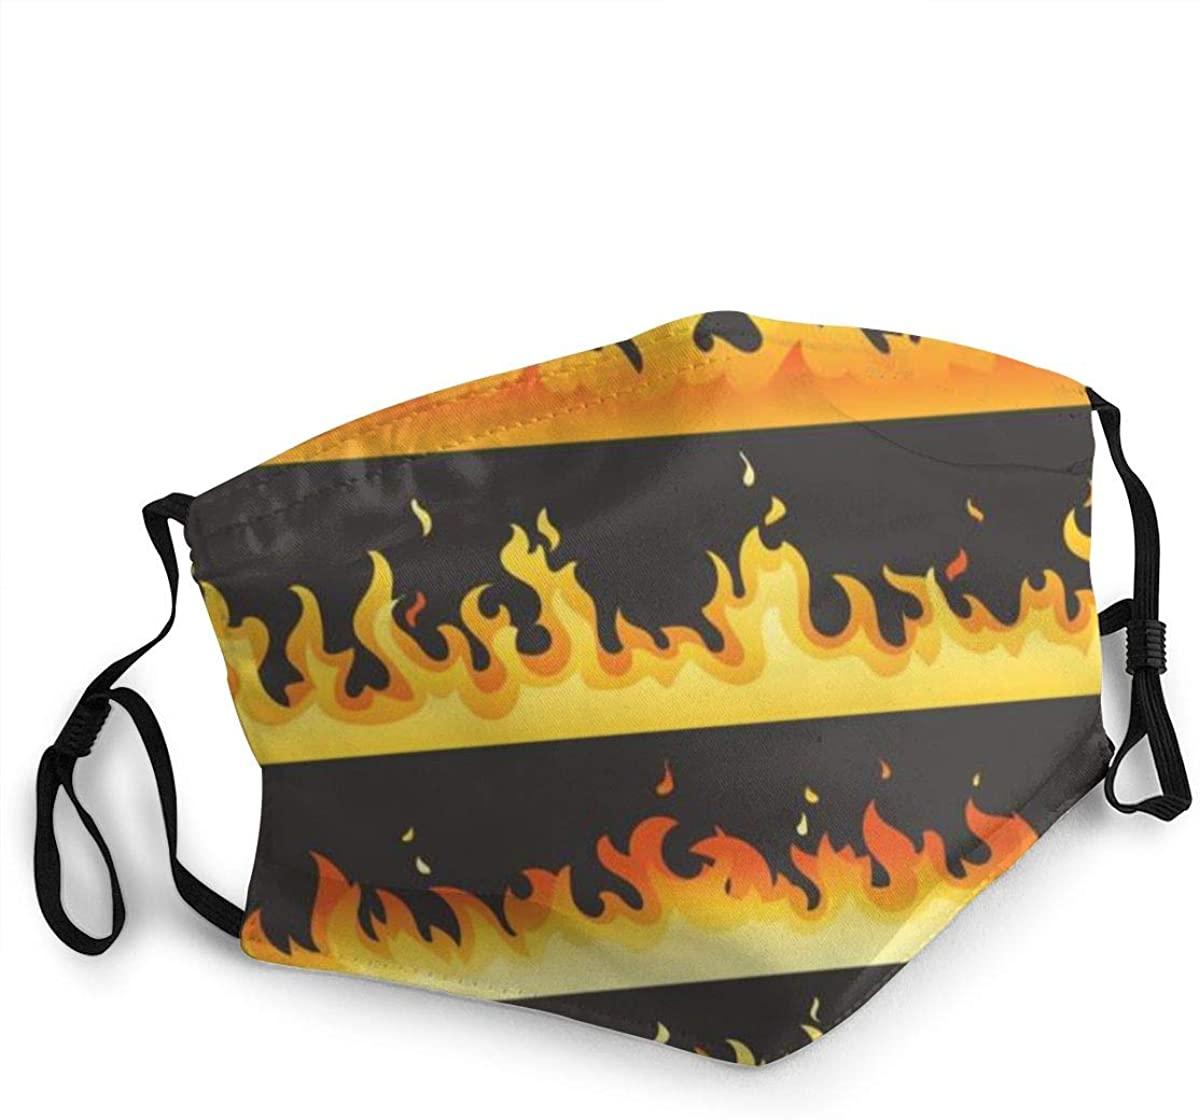 Fashion Protective Face Masks, Hot Fire Unisex Dust Mouth Masks, Washable, Reusable Masks